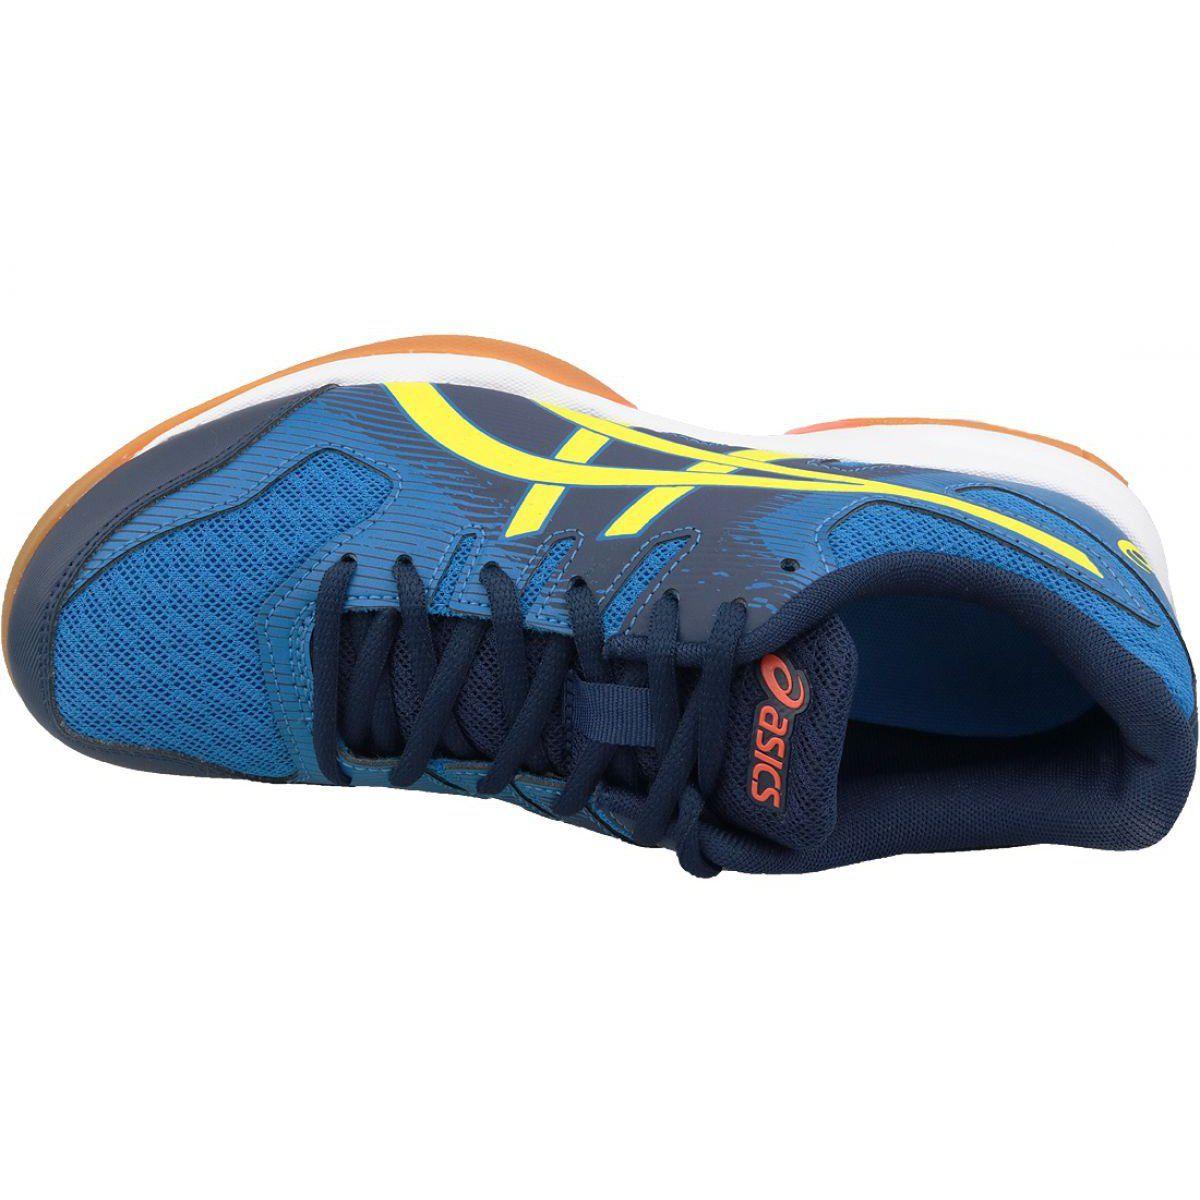 Asics Gel Rocket 9 M 1071A030 400 volleyball shoes blue blue